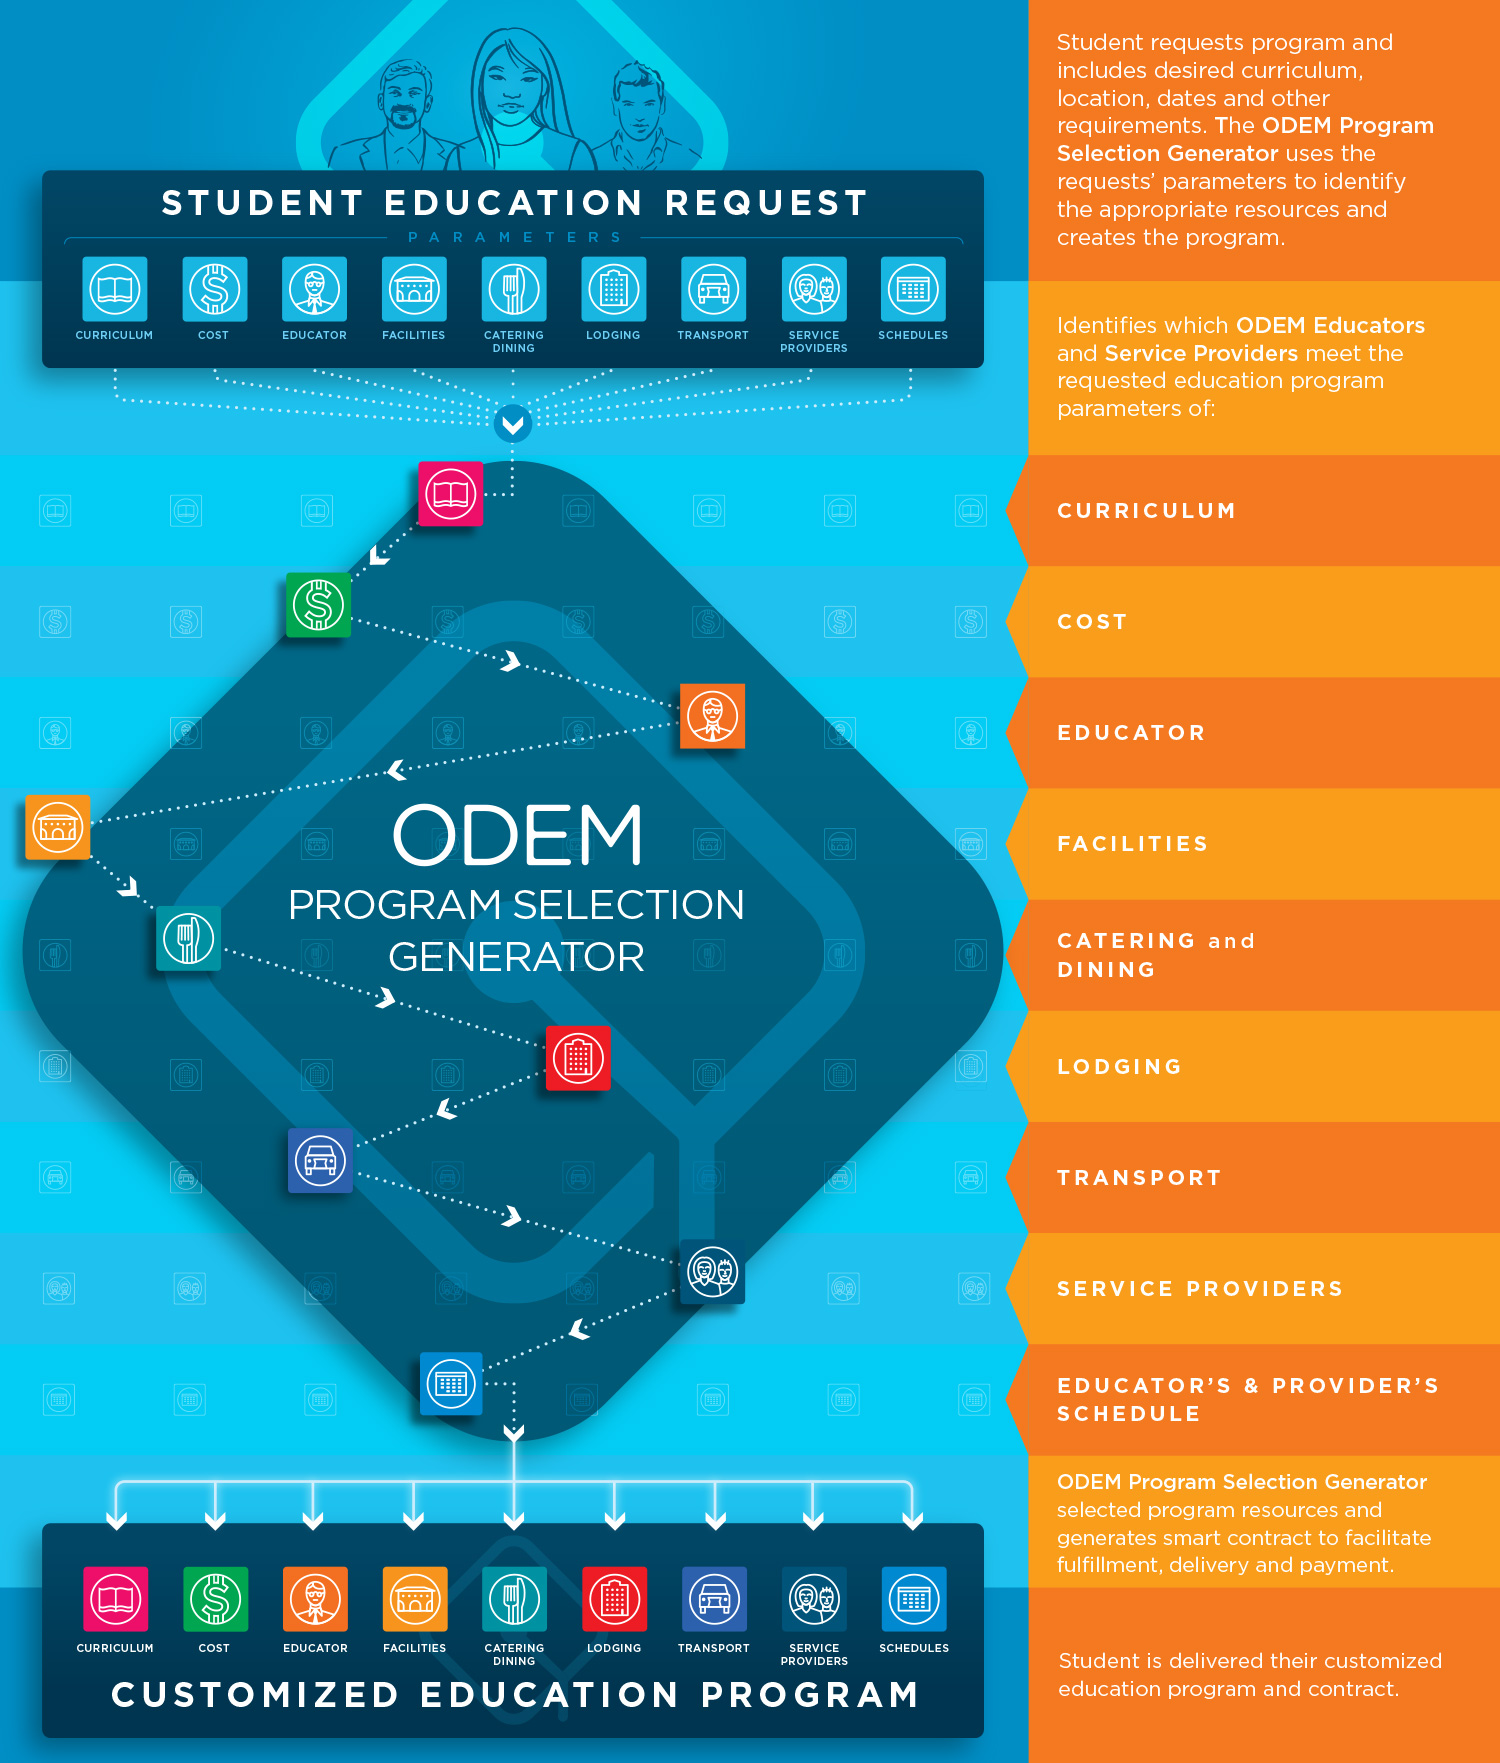 ODEM-program-generator.jpg